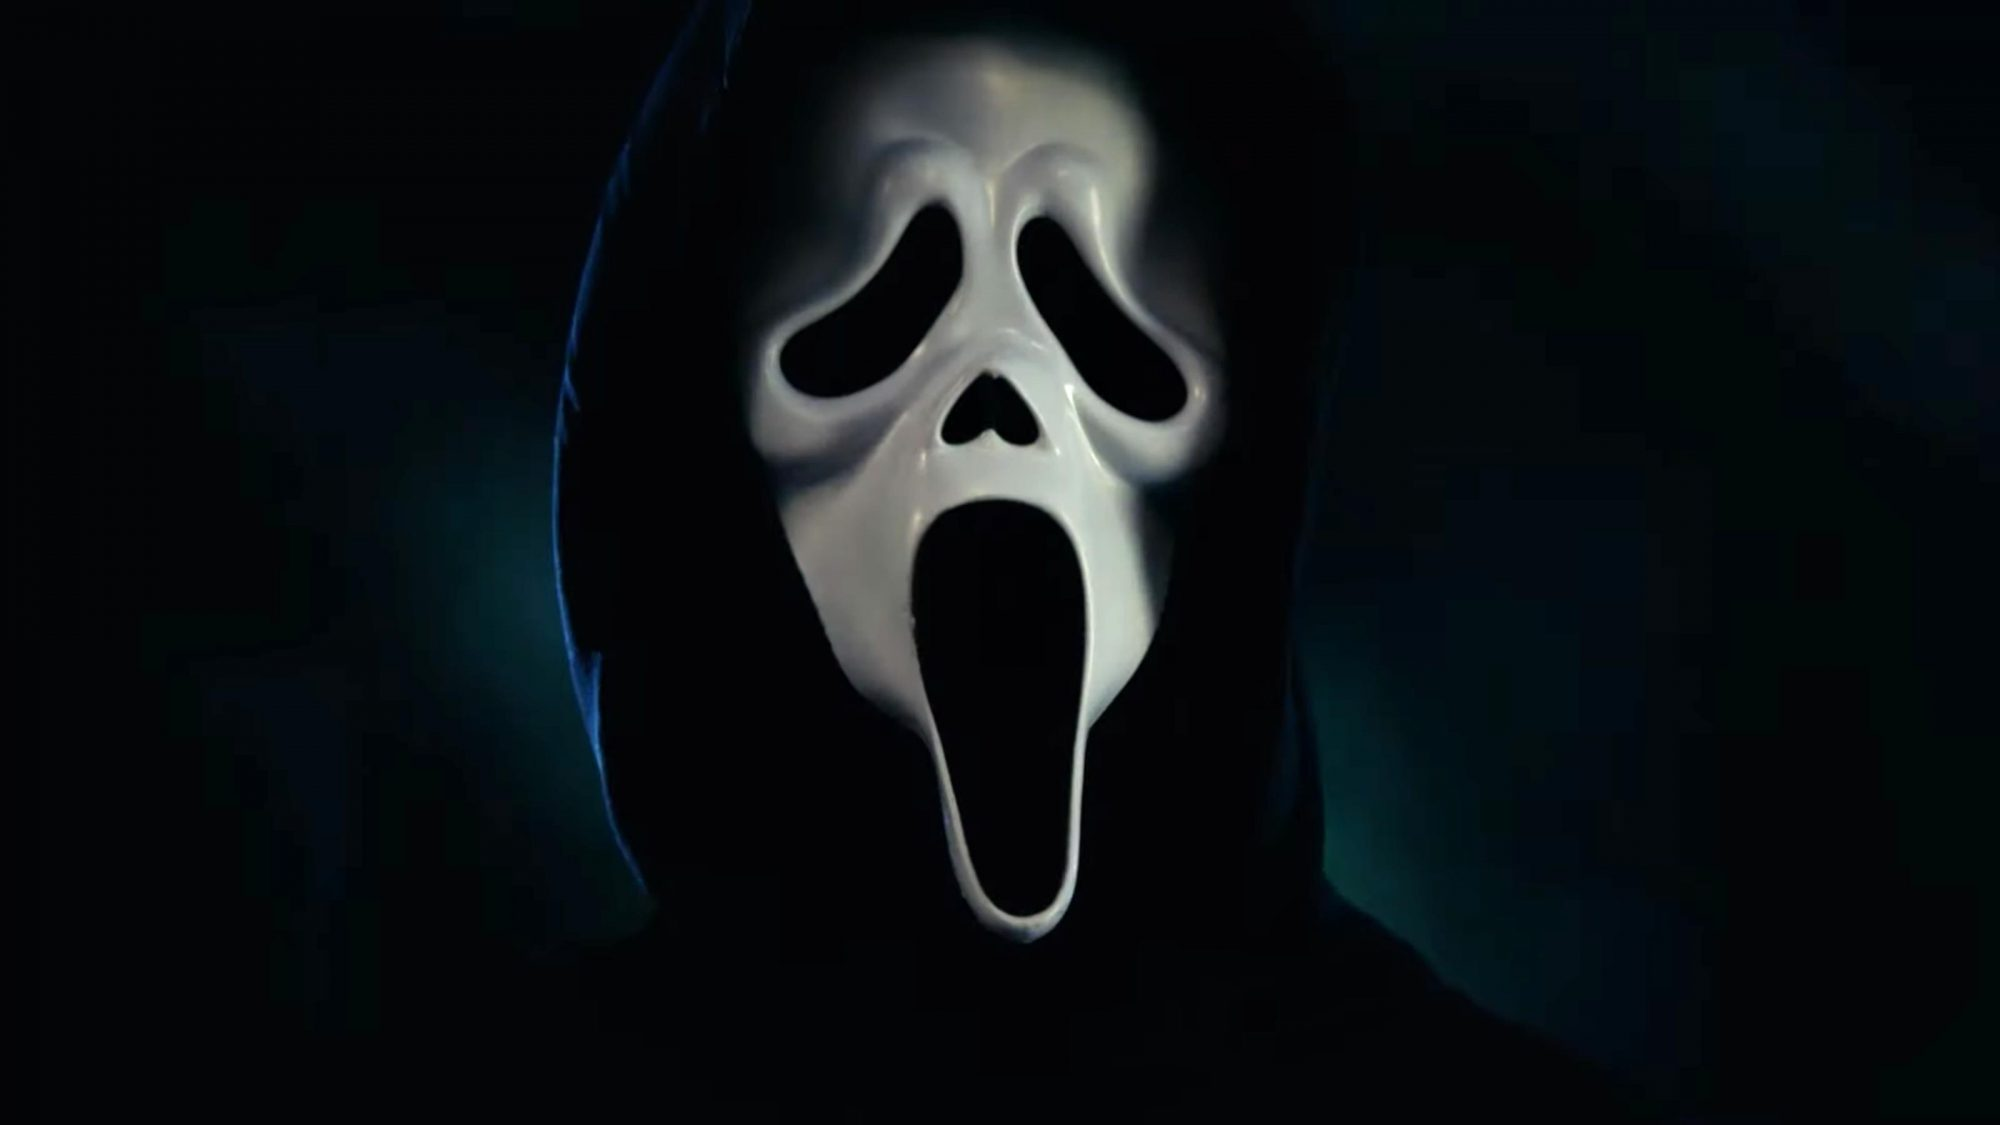 VH1's Scream | First Look (screen grab) https://www.youtube.com/watch?v=_Xn9bE4z7_8 CR: VH1